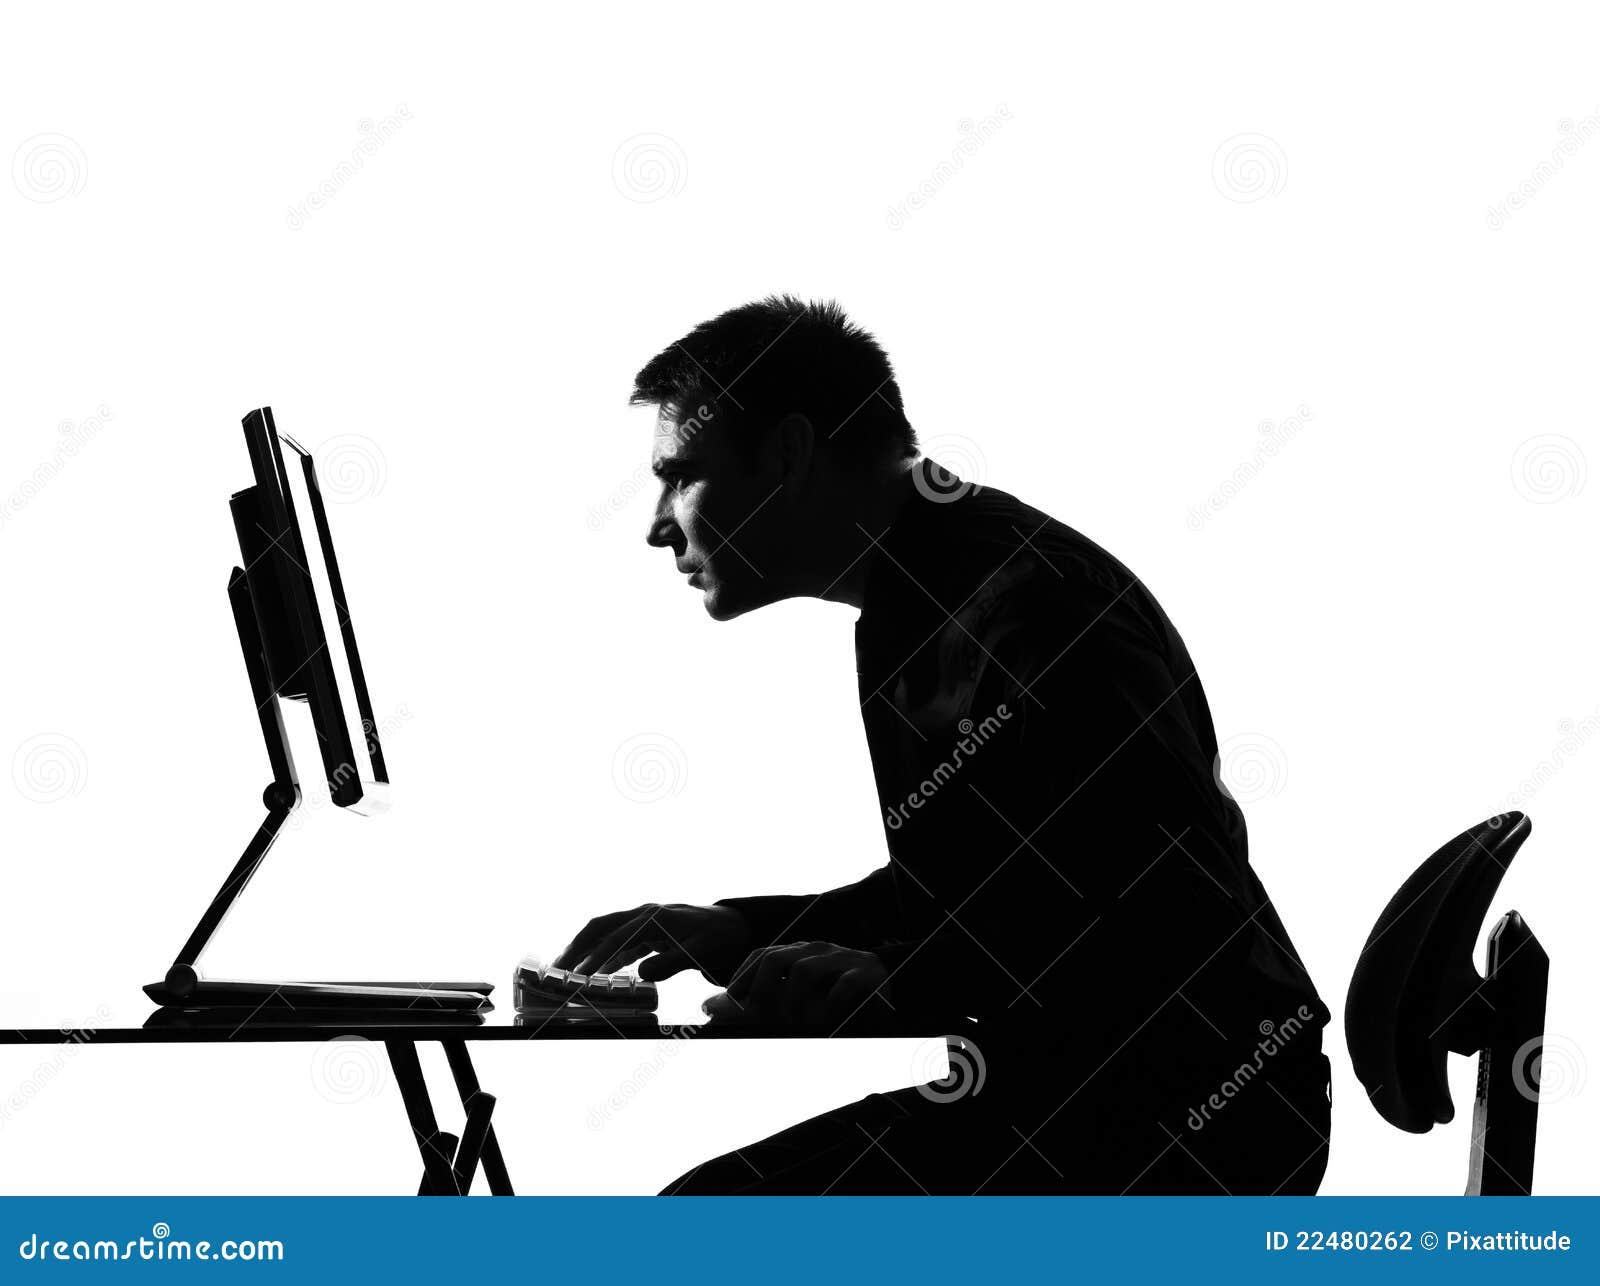 Siluetee mirar fijamente computacional del hombre en el monir